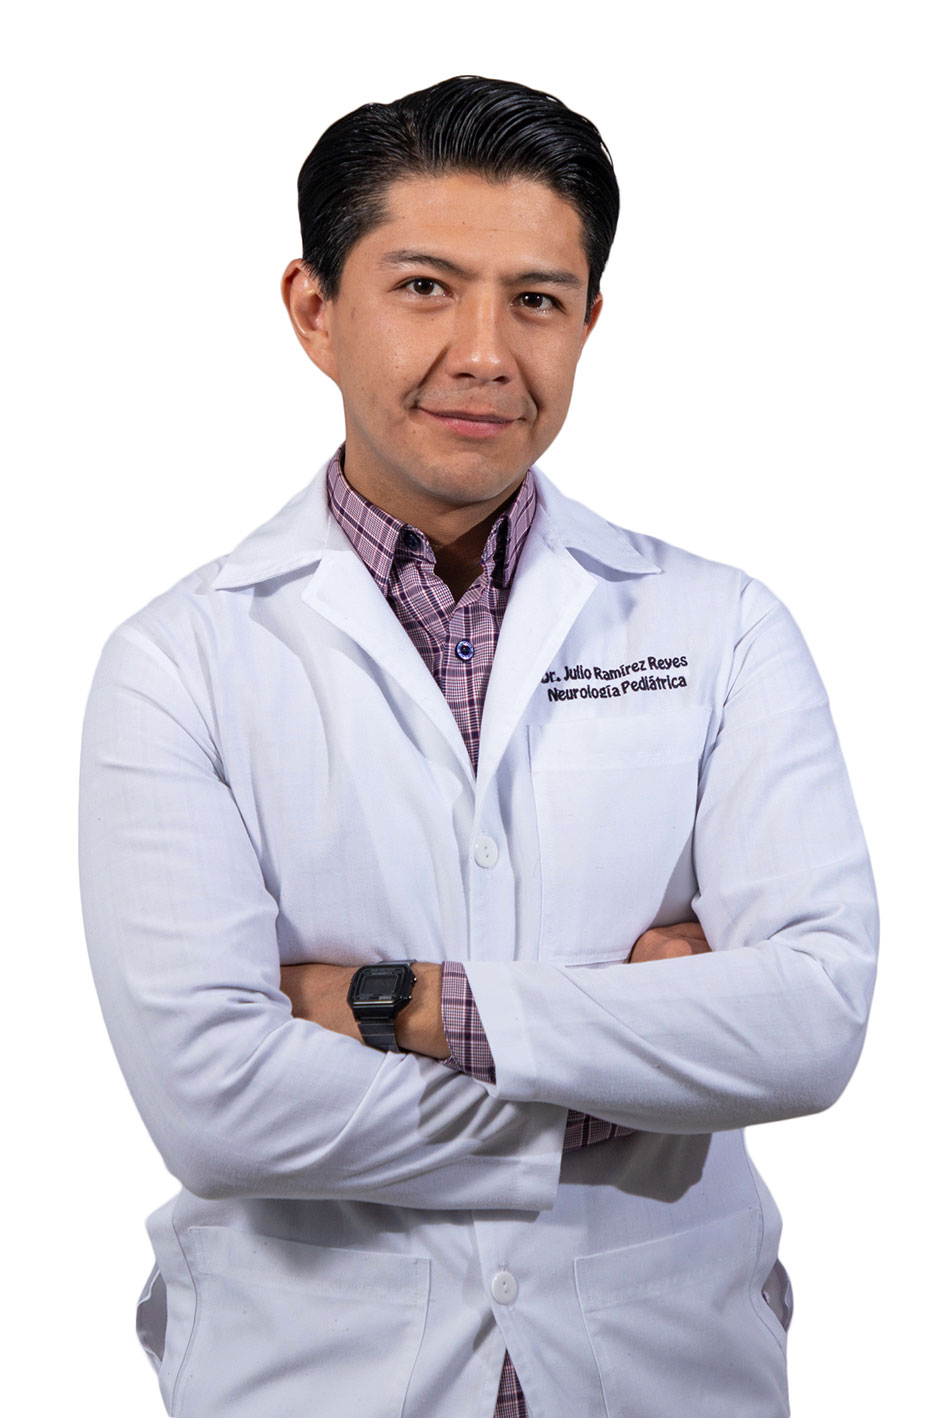 JulioCesarRamirez2